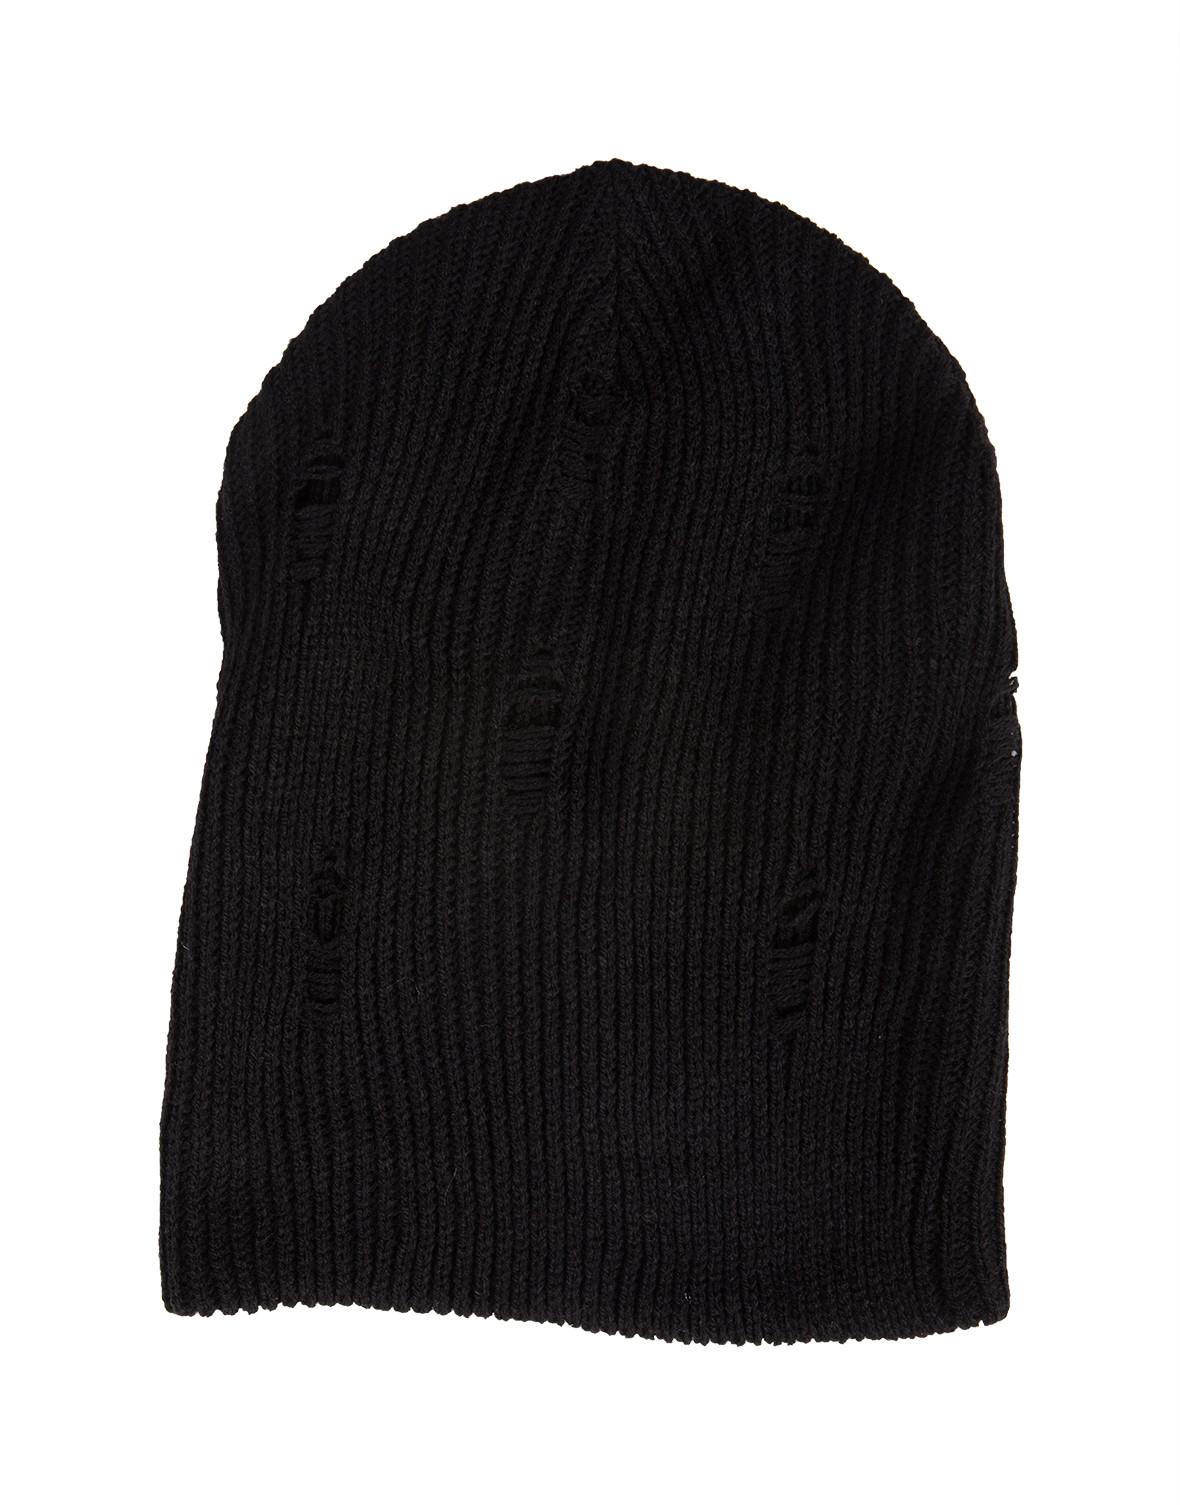 Shredded Knit Beanie | 2020AVE